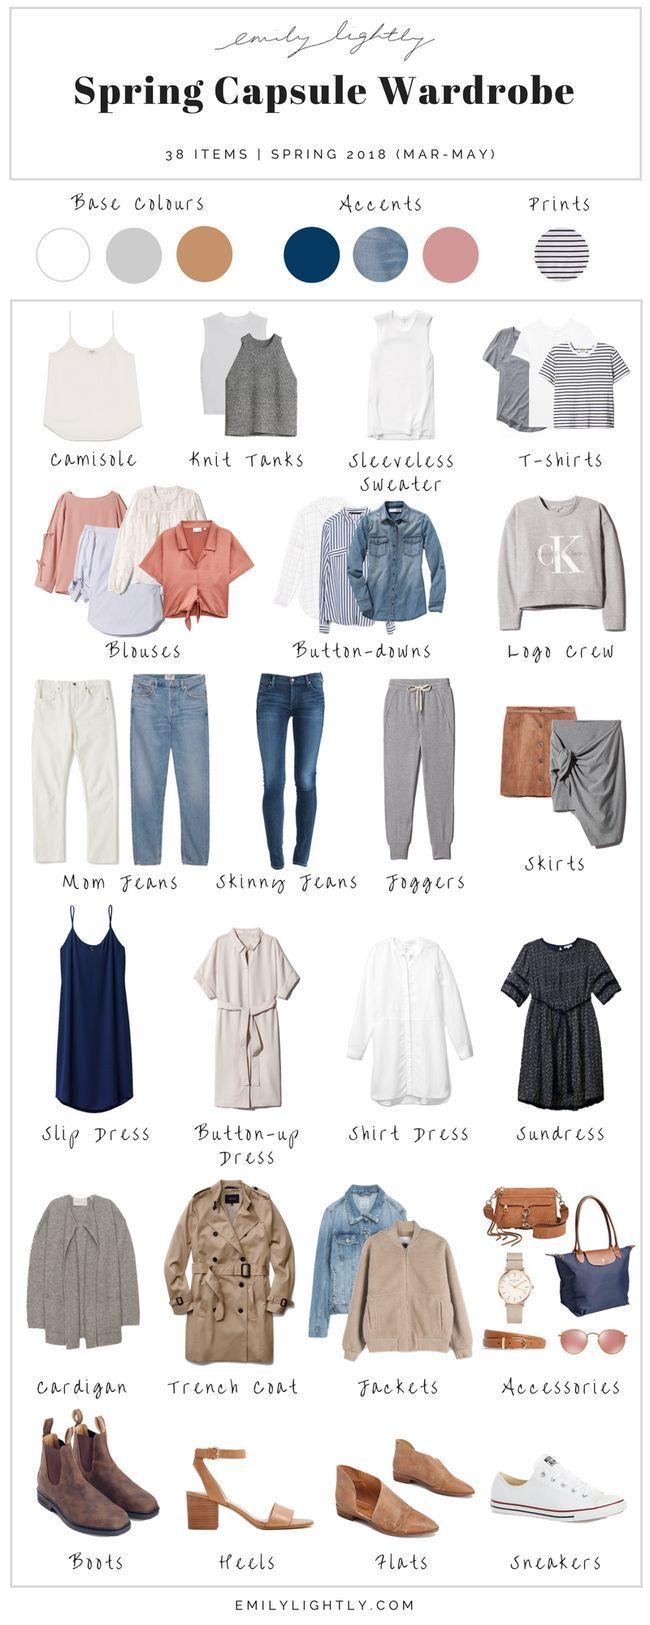 My Spring 2018 Capsule Wardrobe (Emily Flippantly)